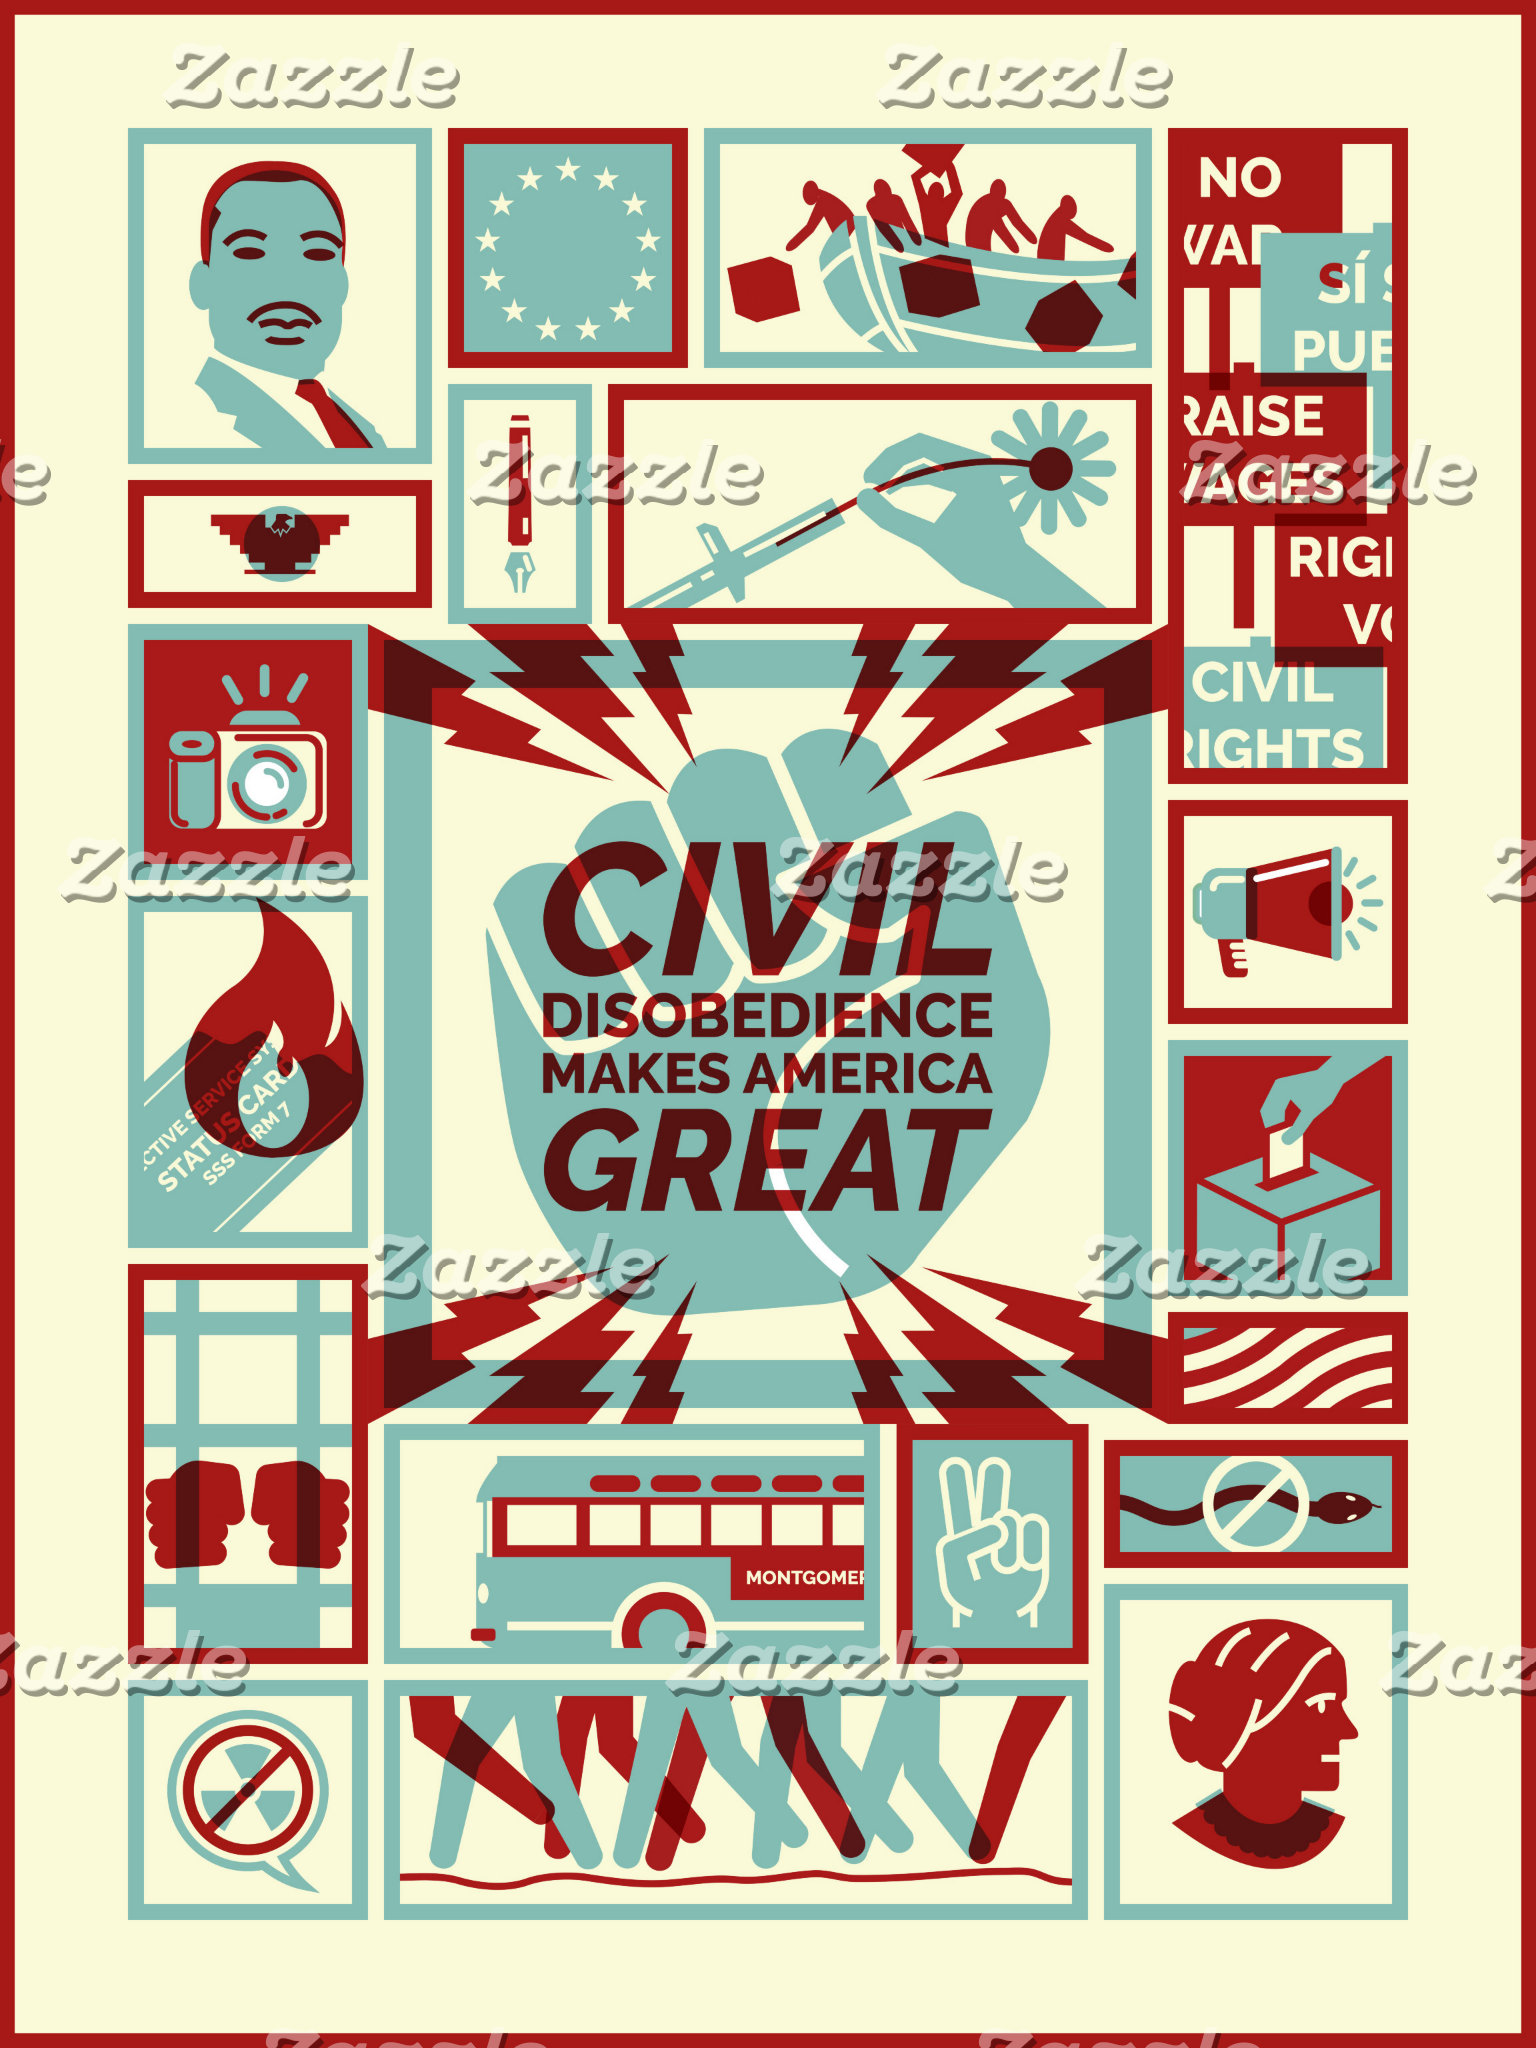 Civil Disobedience Makes America Great